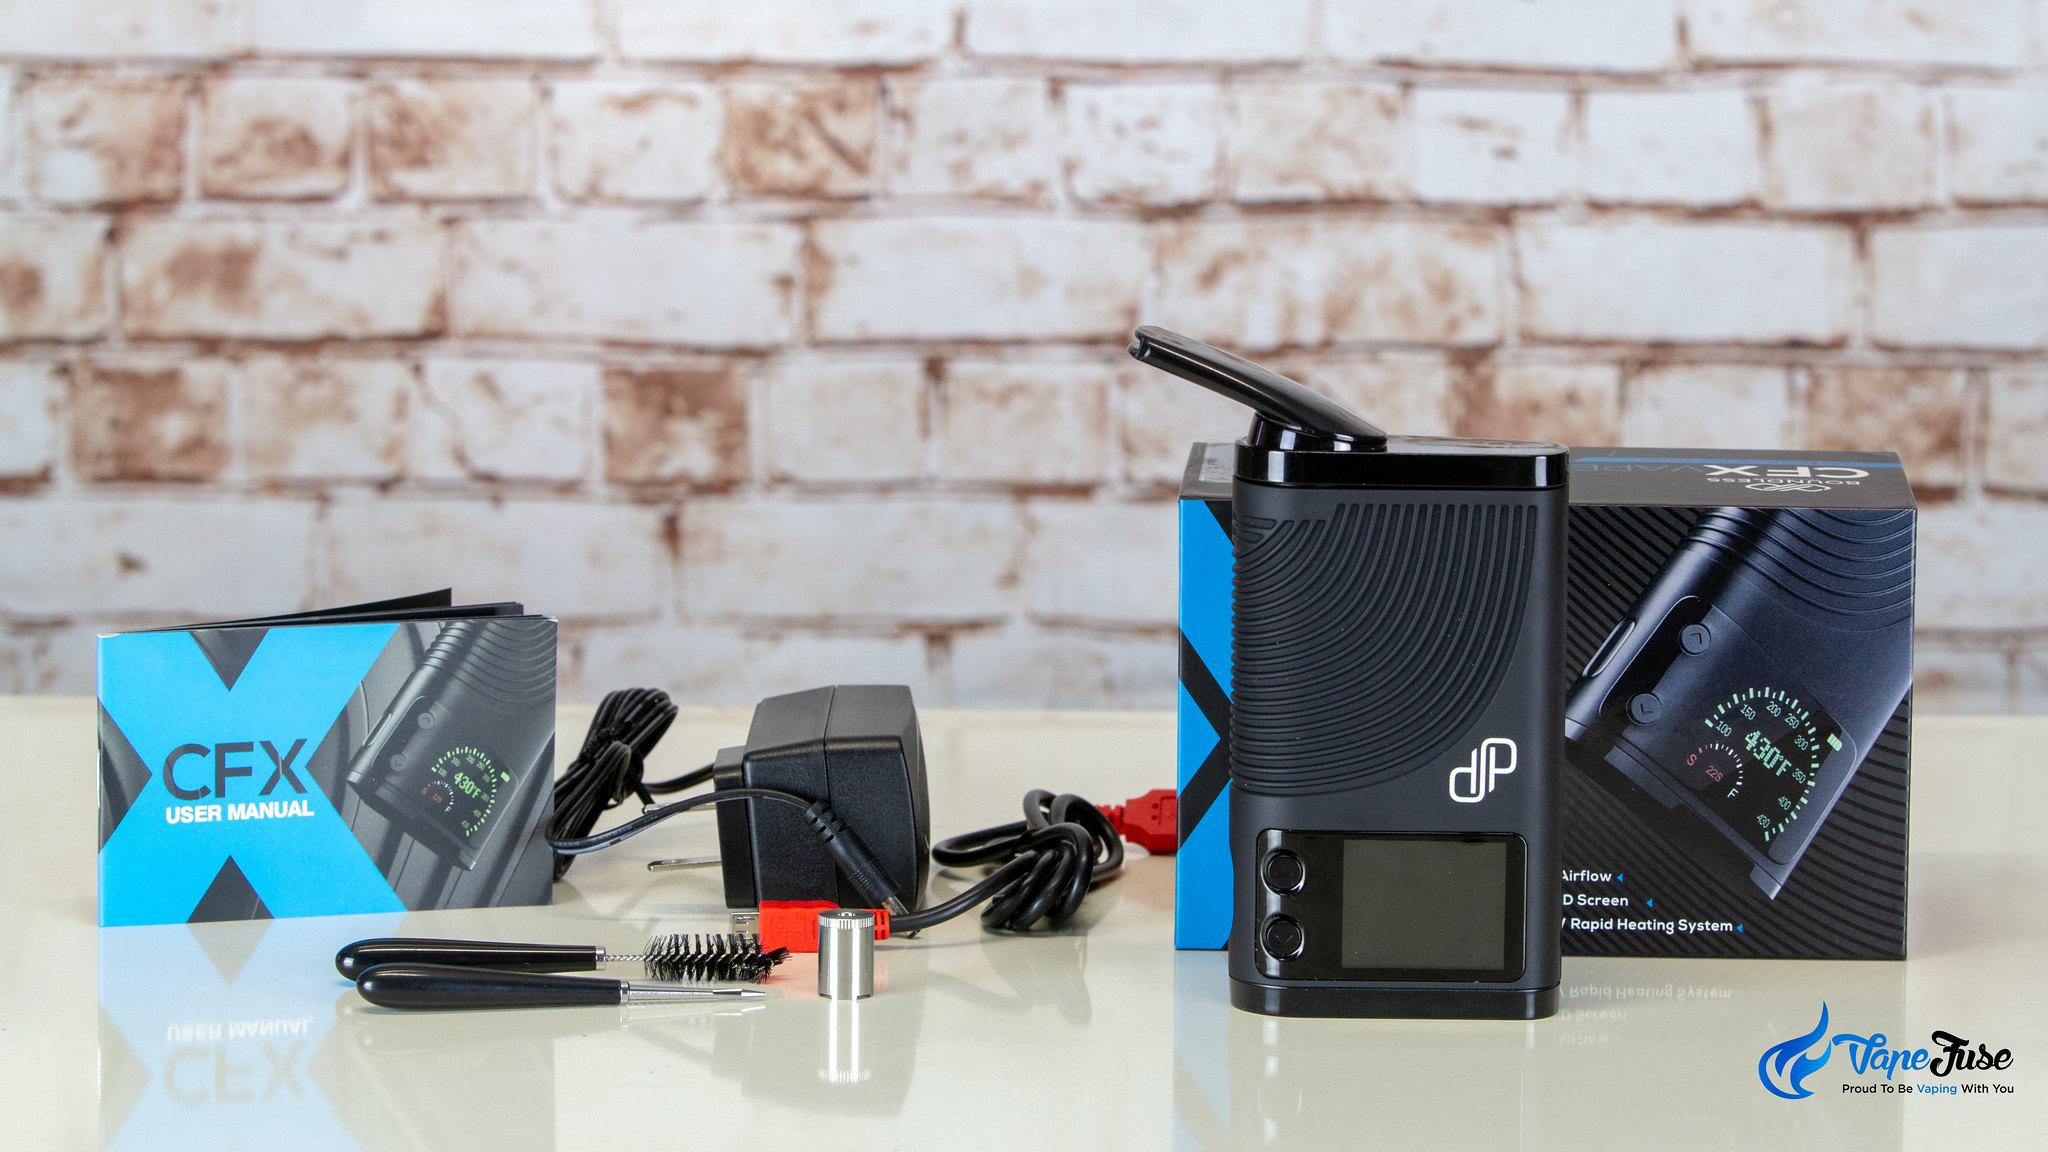 Boundless CFX Portable Herbal Vaporizer kit inclusions